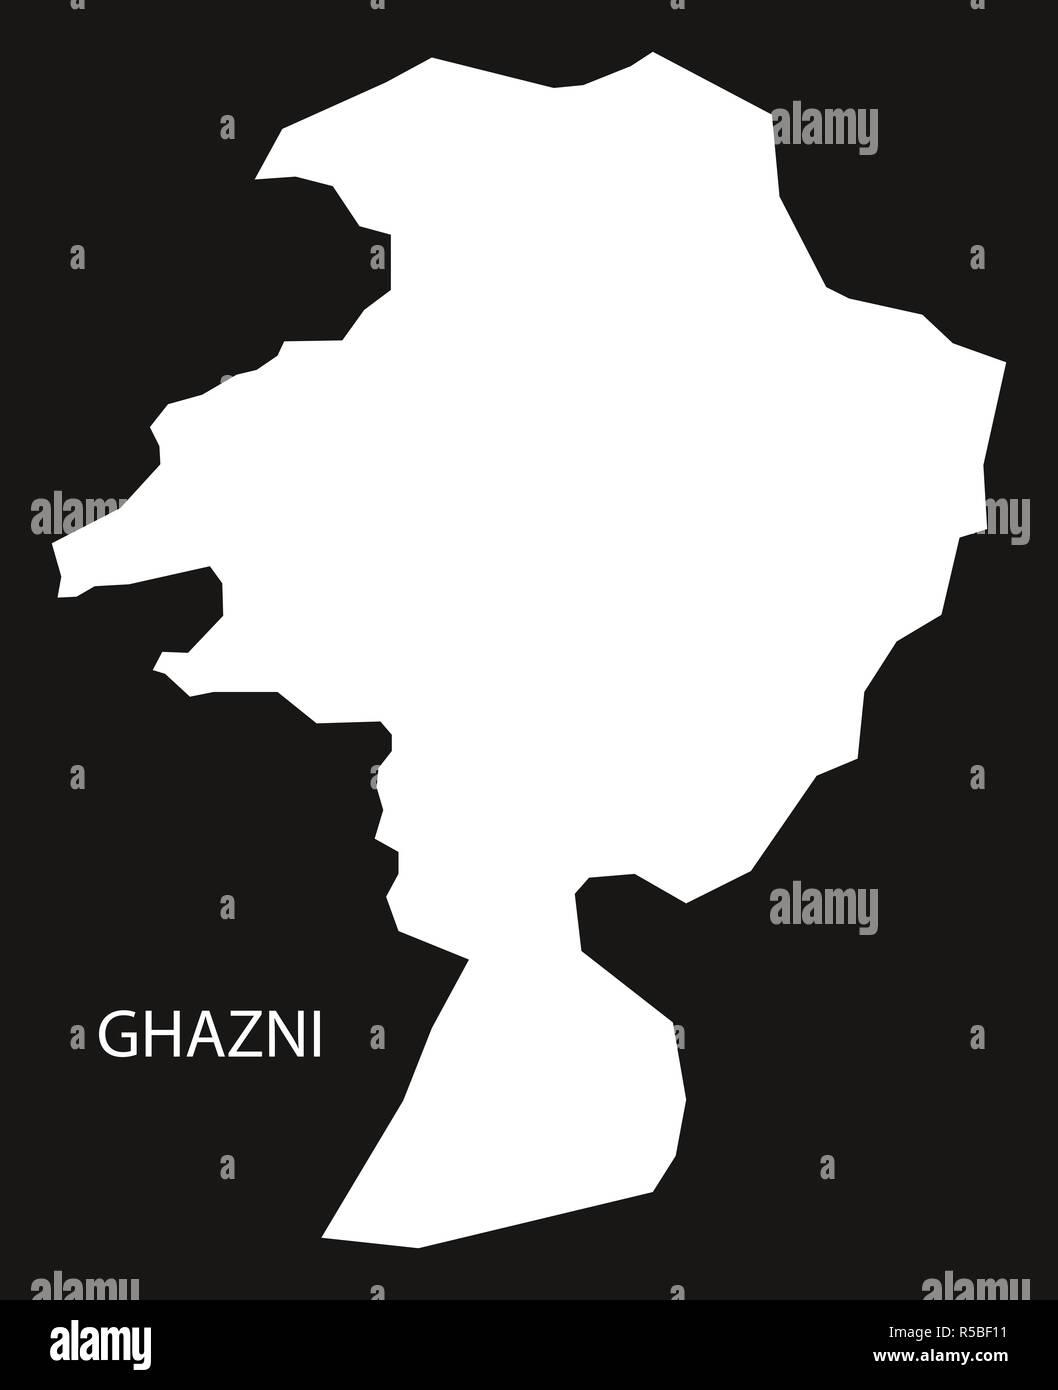 SEX AGENCY Ghazni